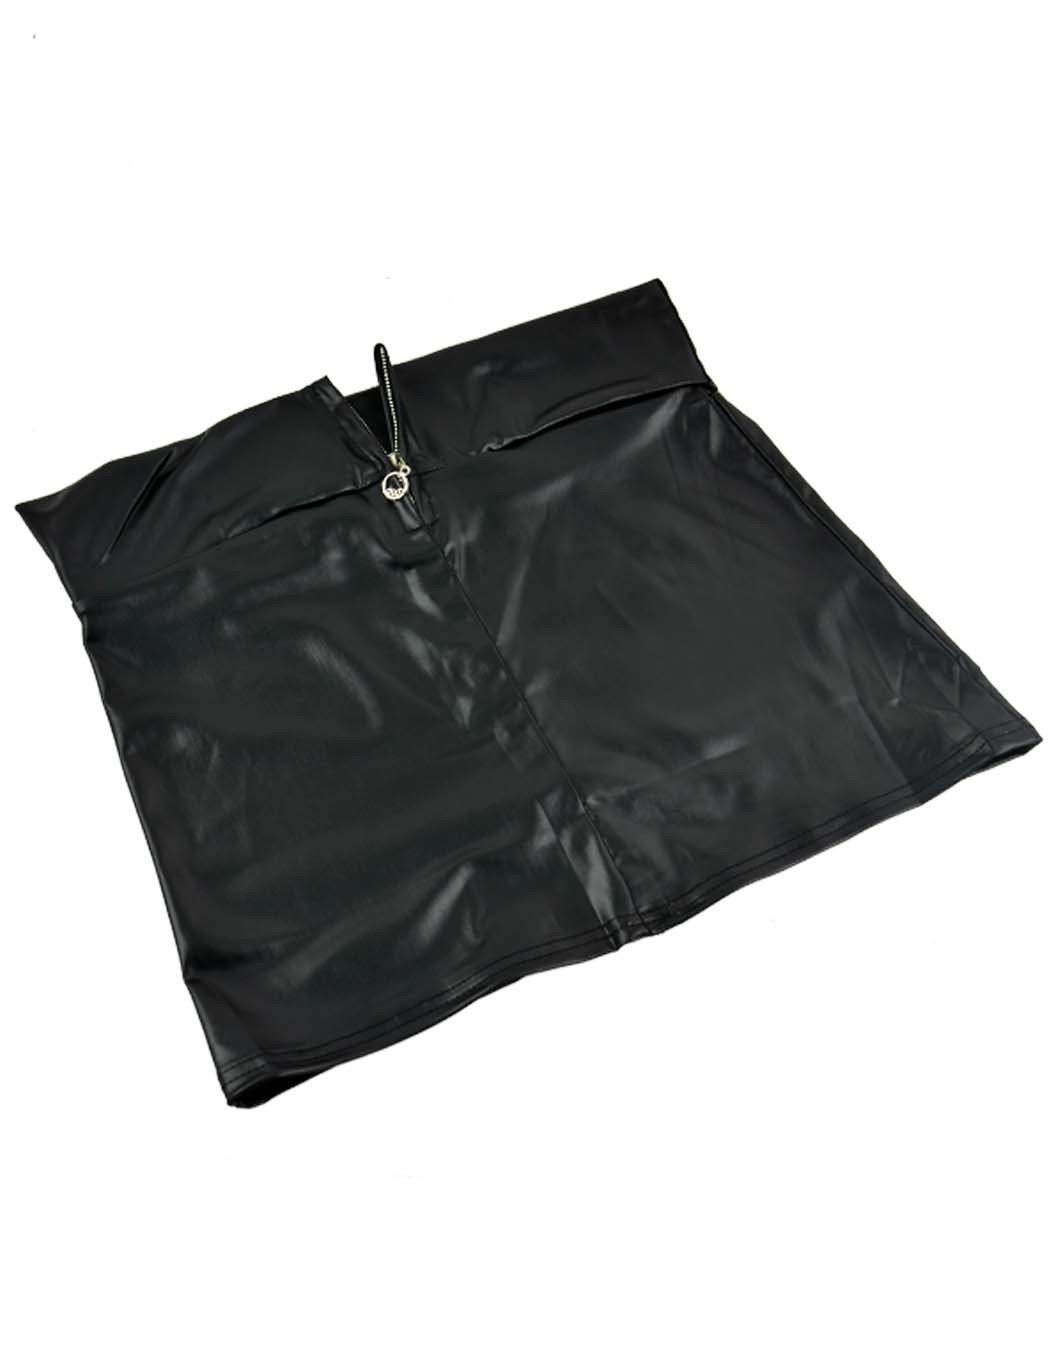 e5080d3dd9ad9 Get Quotations · Women European Style Zipper High Elastic Close-fitting Faux  Leather Mini Skirt